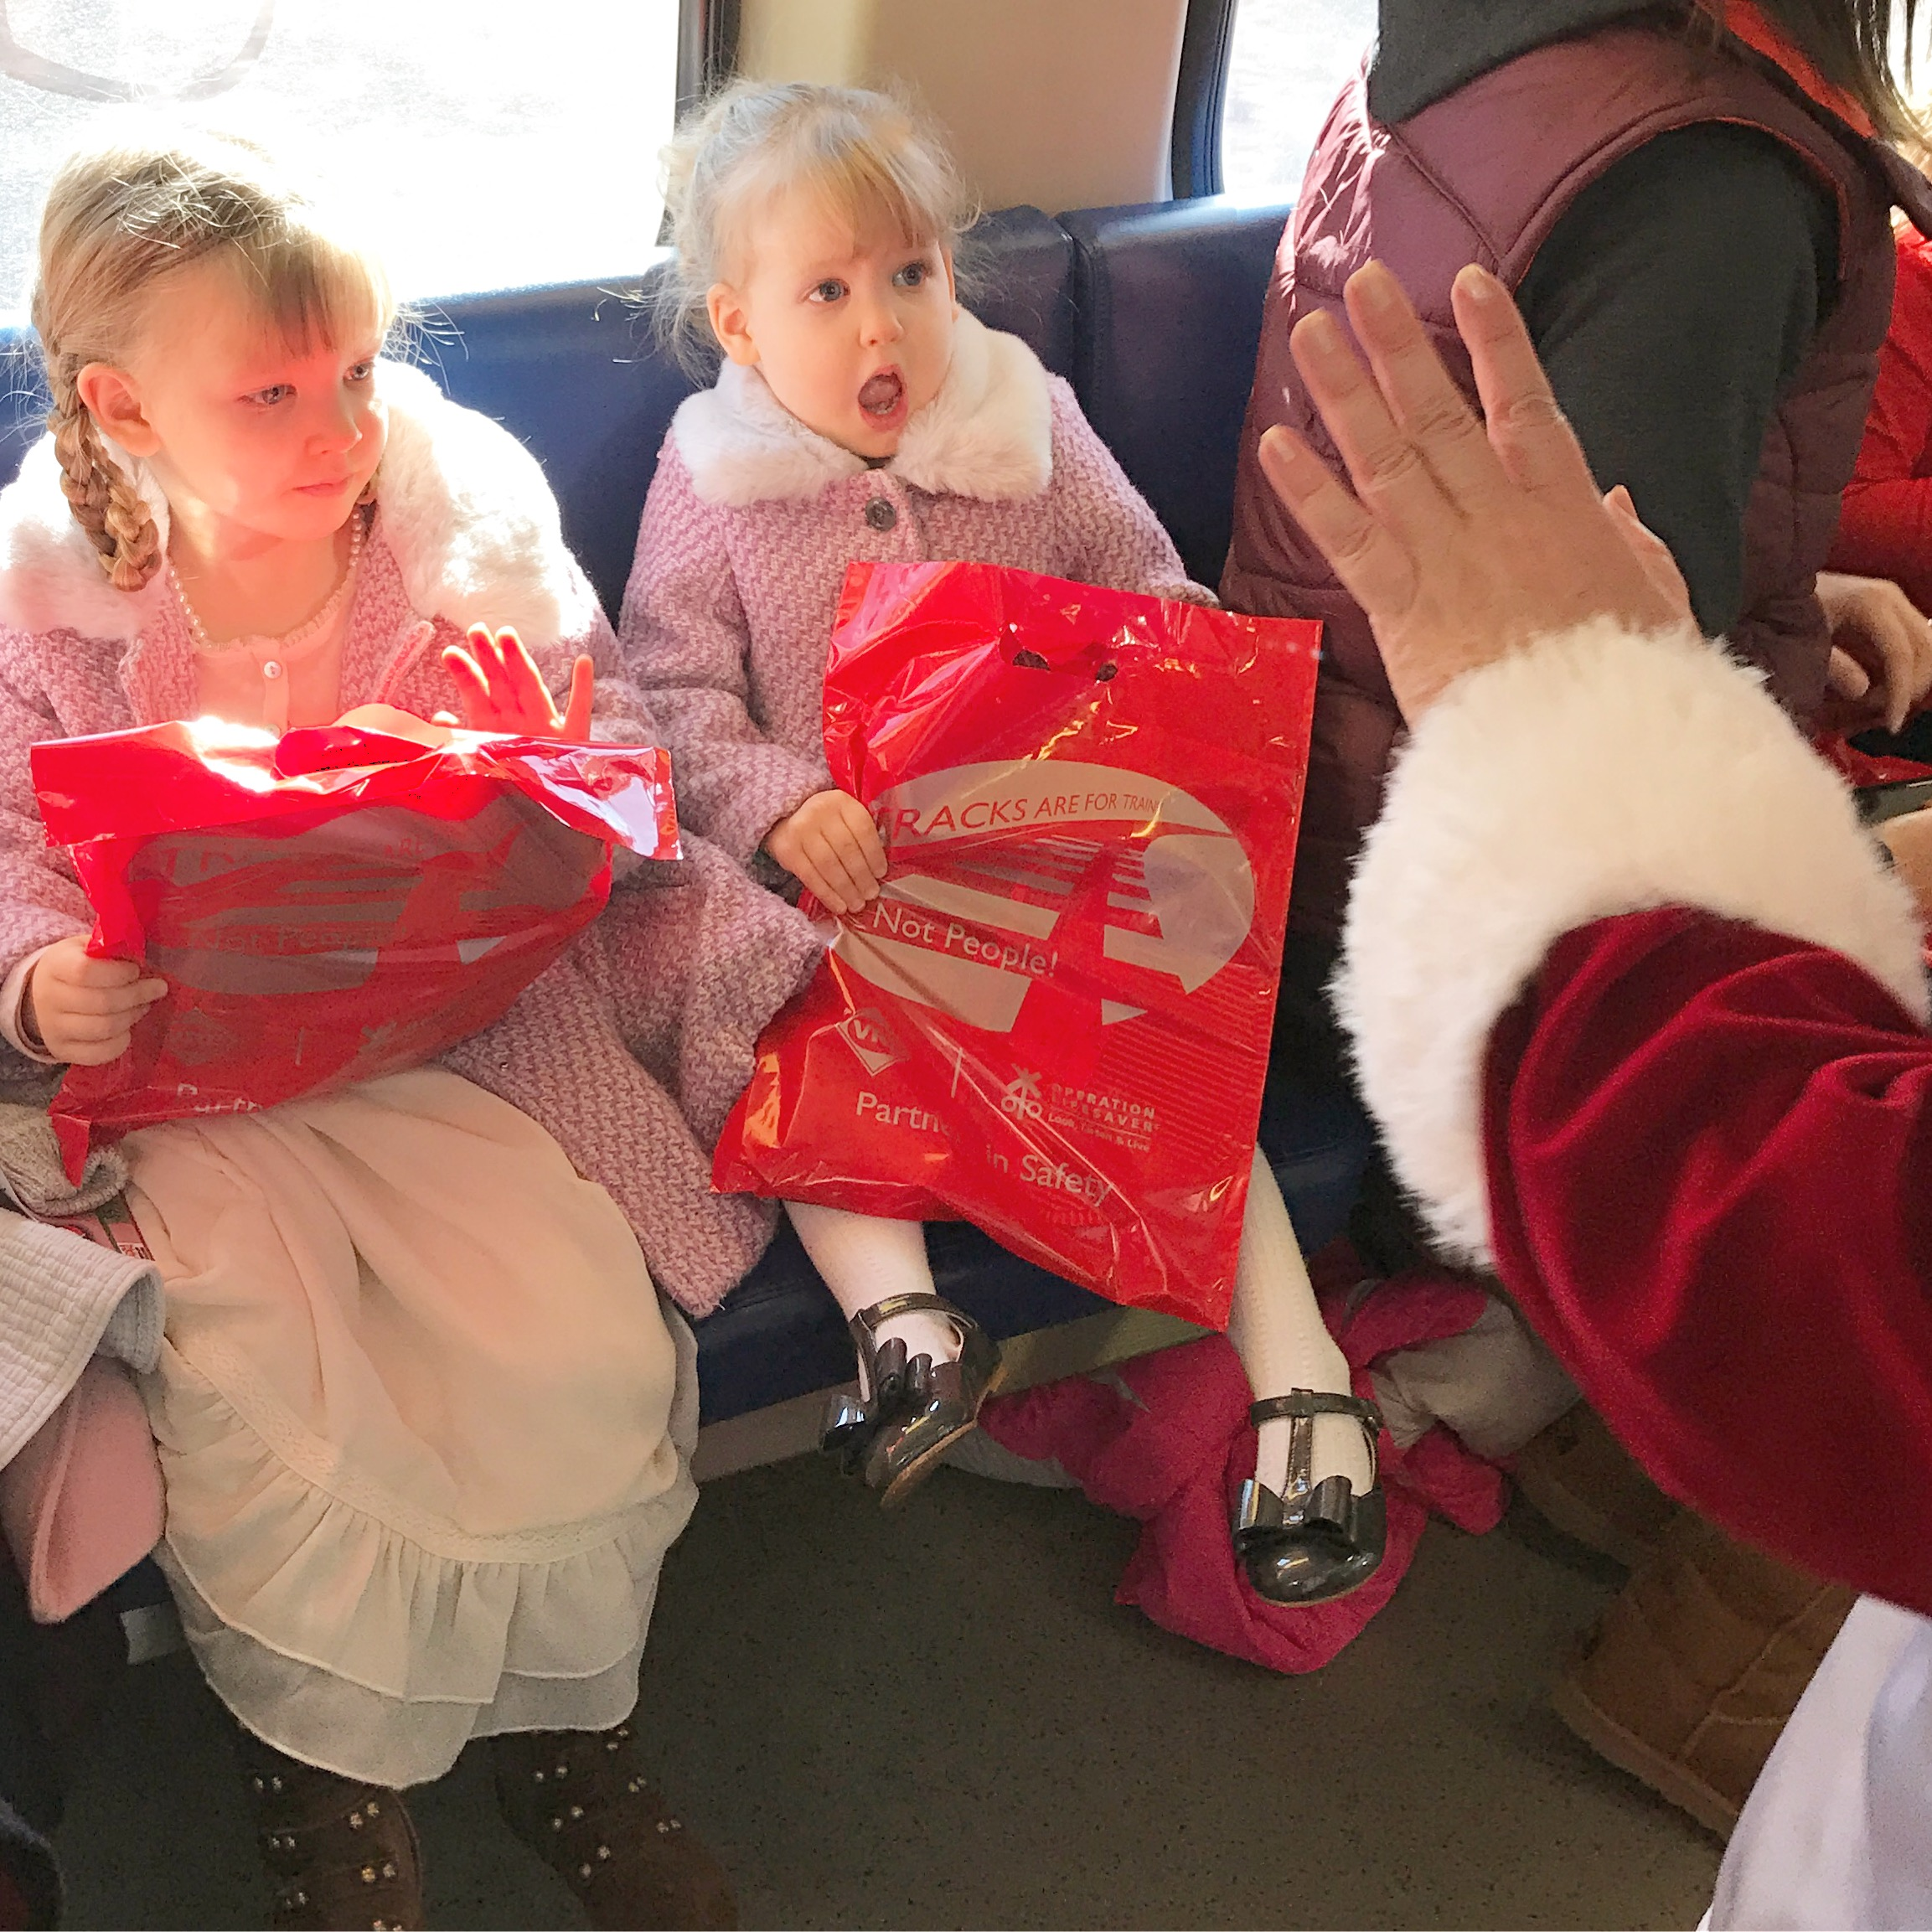 The Santa Train in Manassas! Heidi was shocked seeing Mrs. Claus.